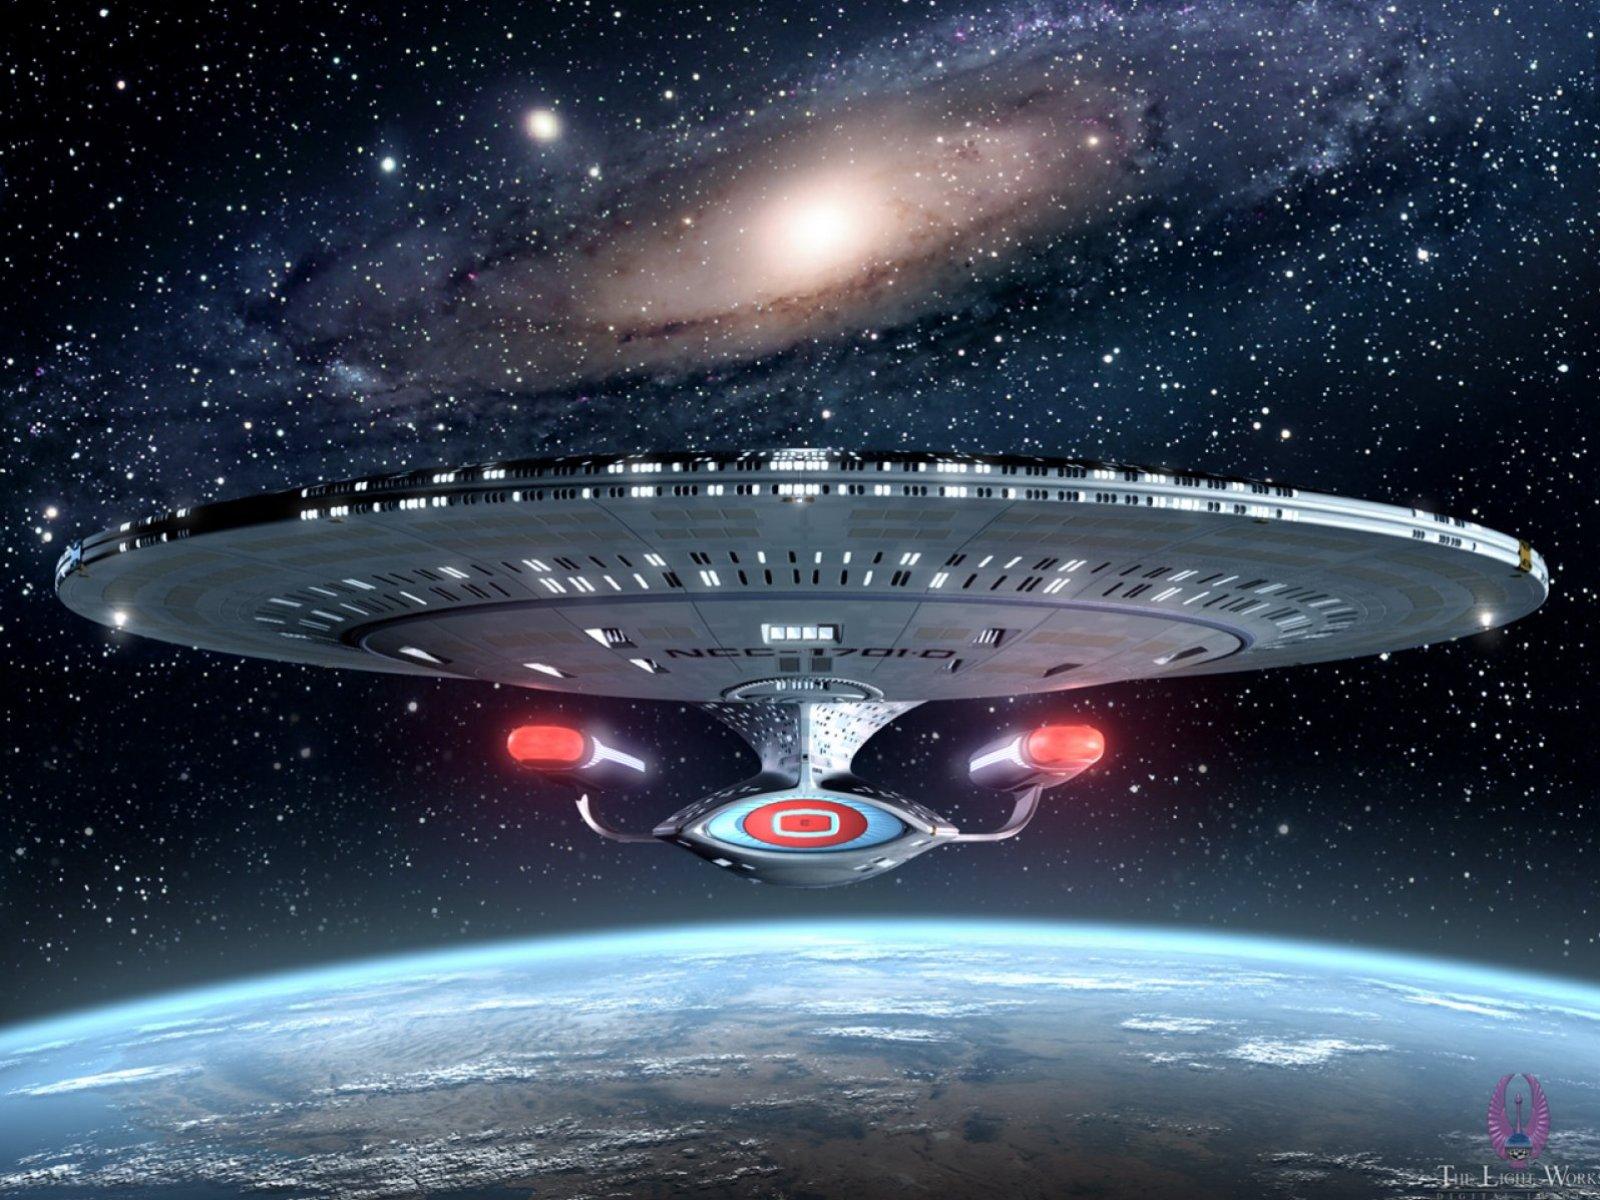 Which Starship Enterprise is the best Starship Enterprise Momentum 1600x1200